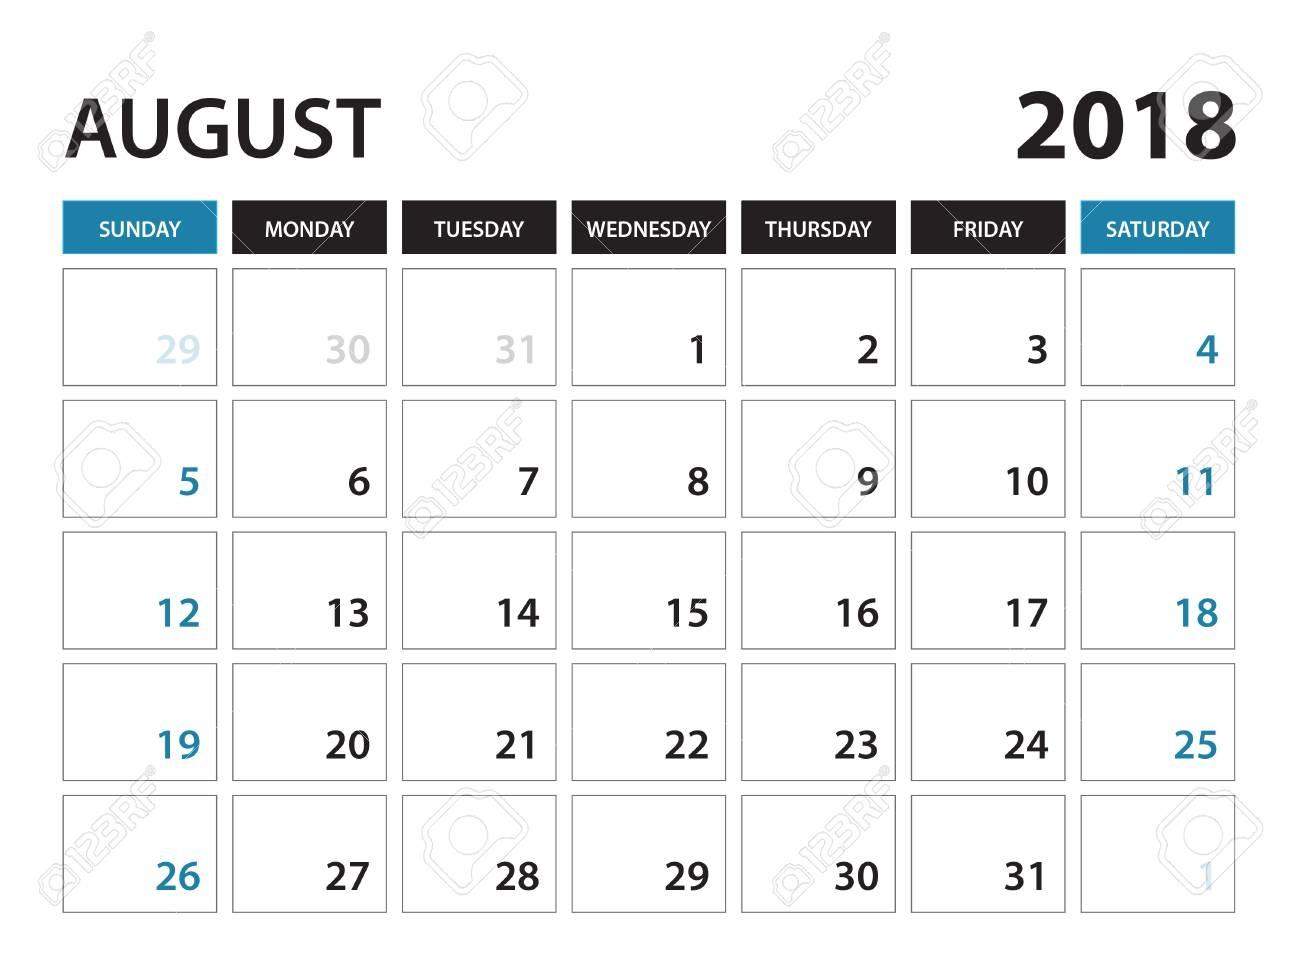 printable calendar for august 2018 planner design template Calendar August 2018 Printable Template erdferdf